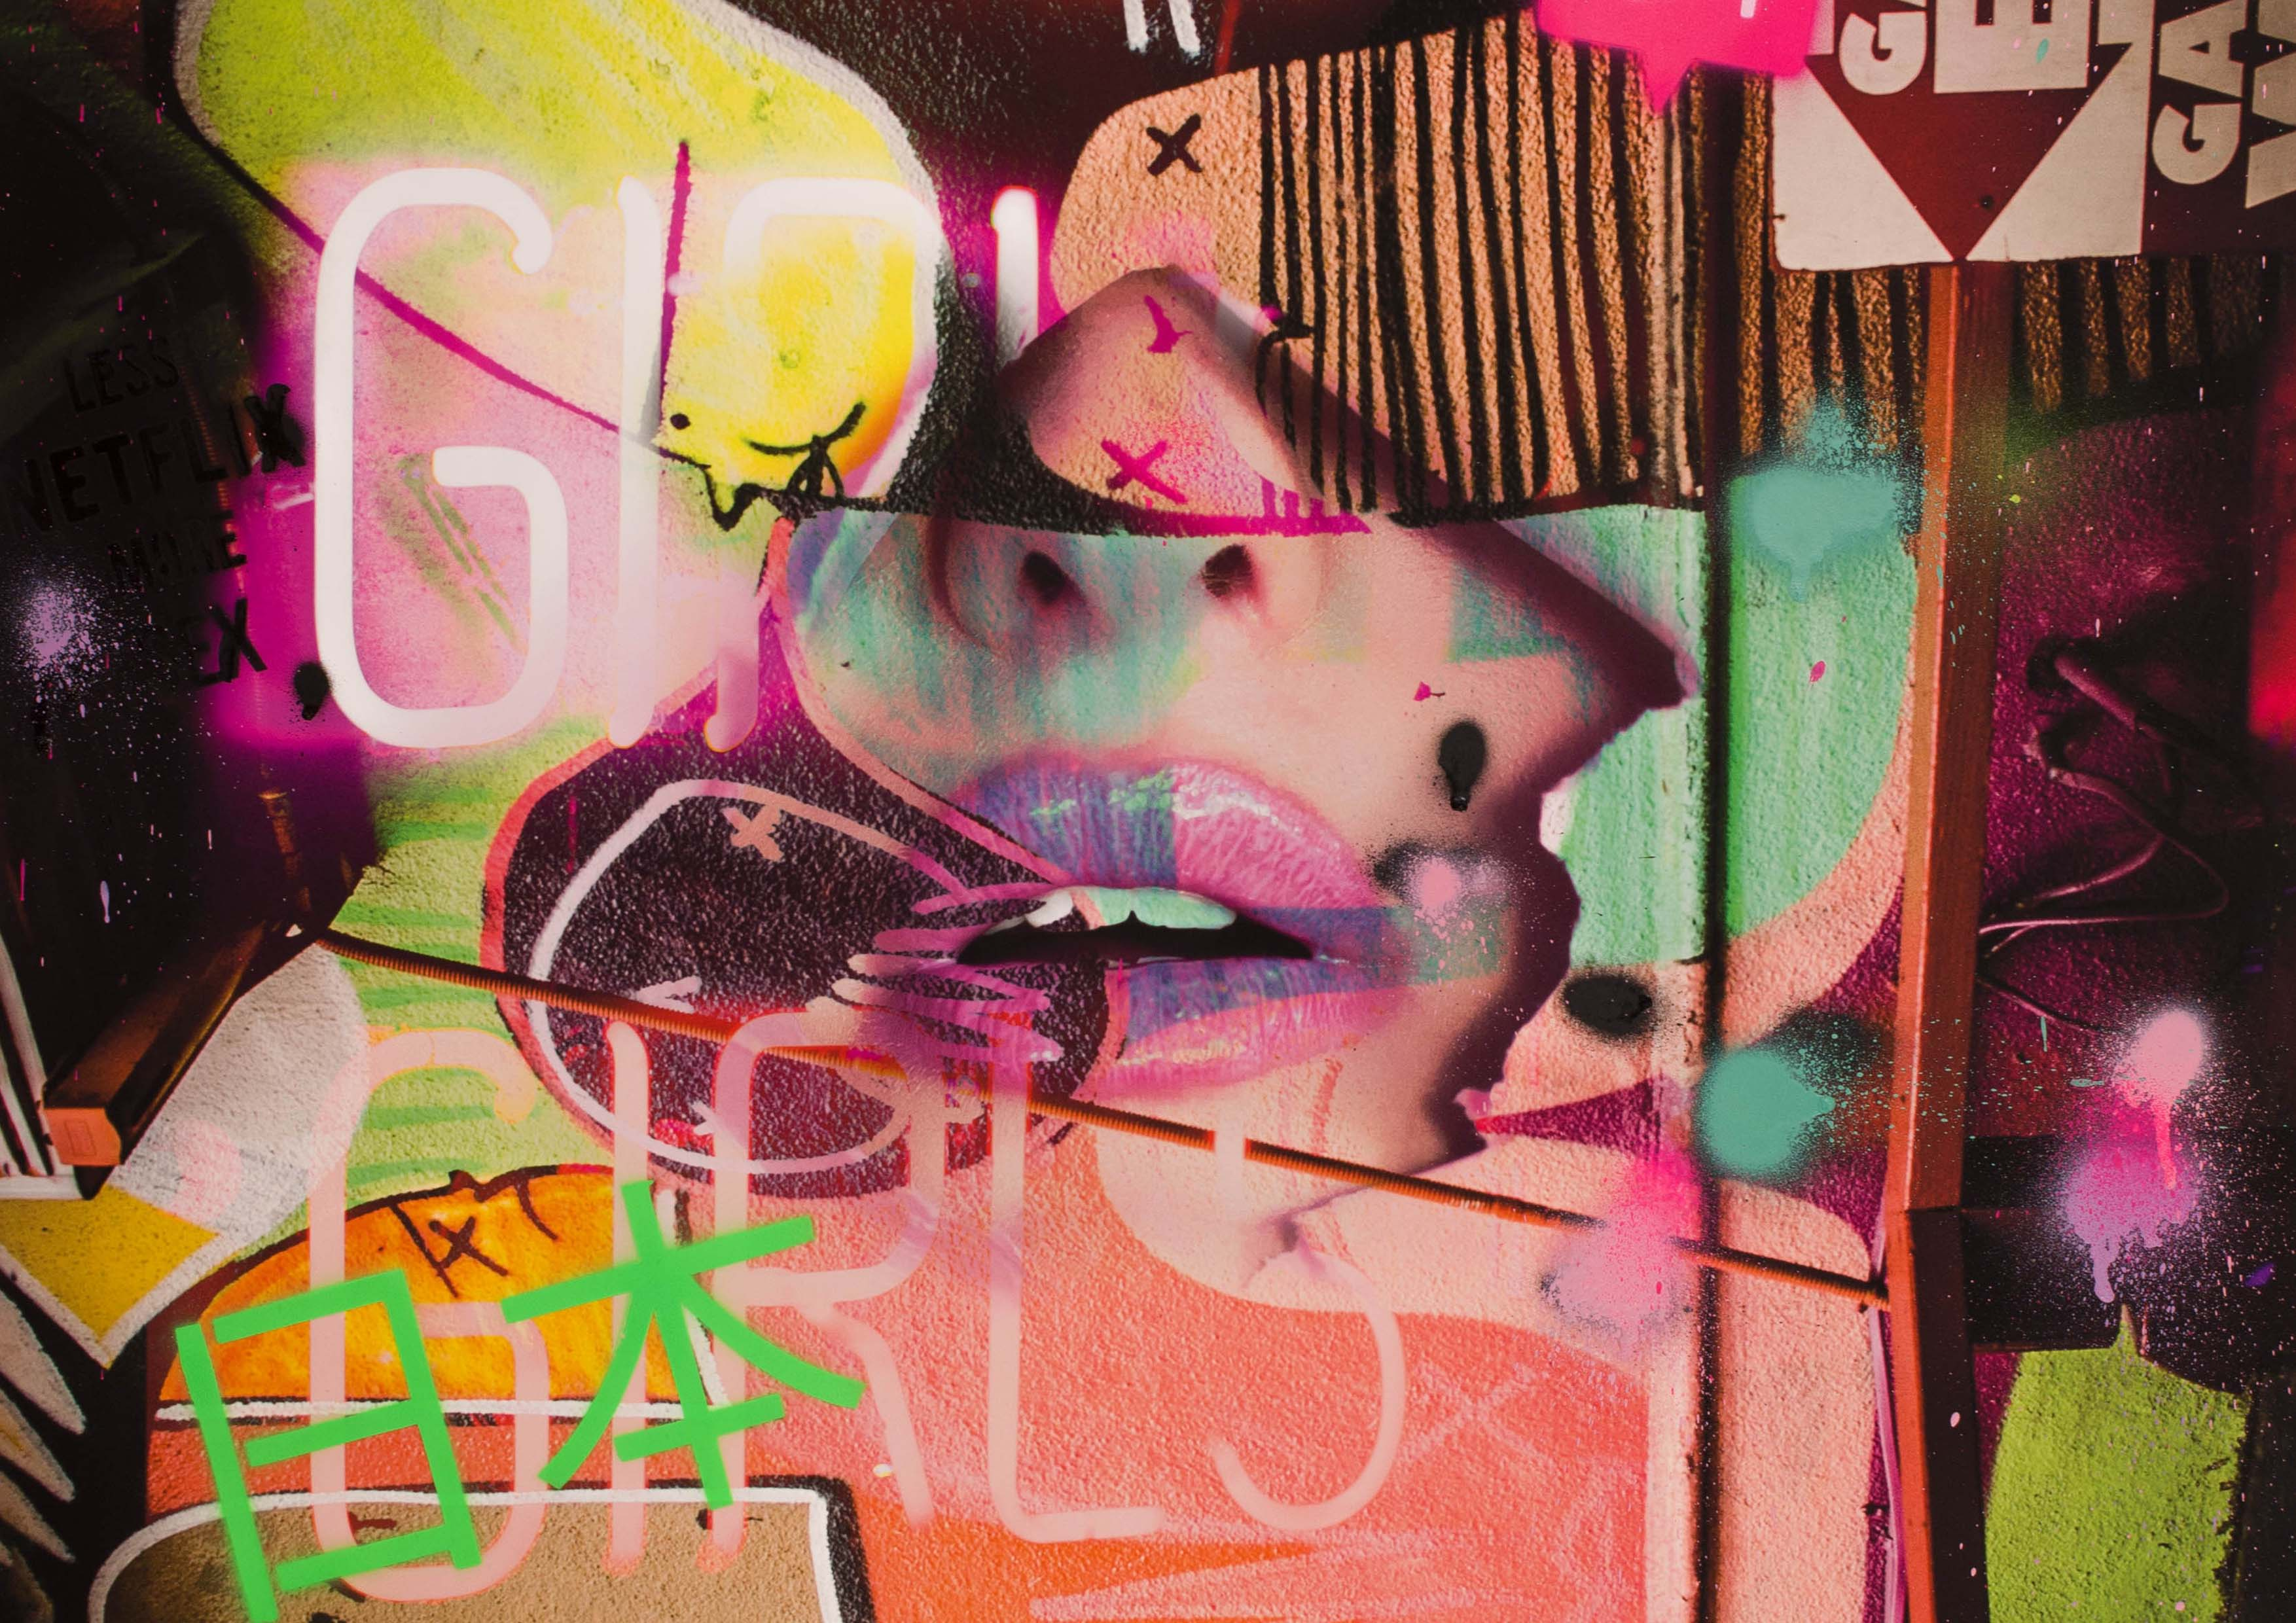 NATALIE-OTALORA-ART-DIGITAL-TOKIO-LIPS-DETAIL-1